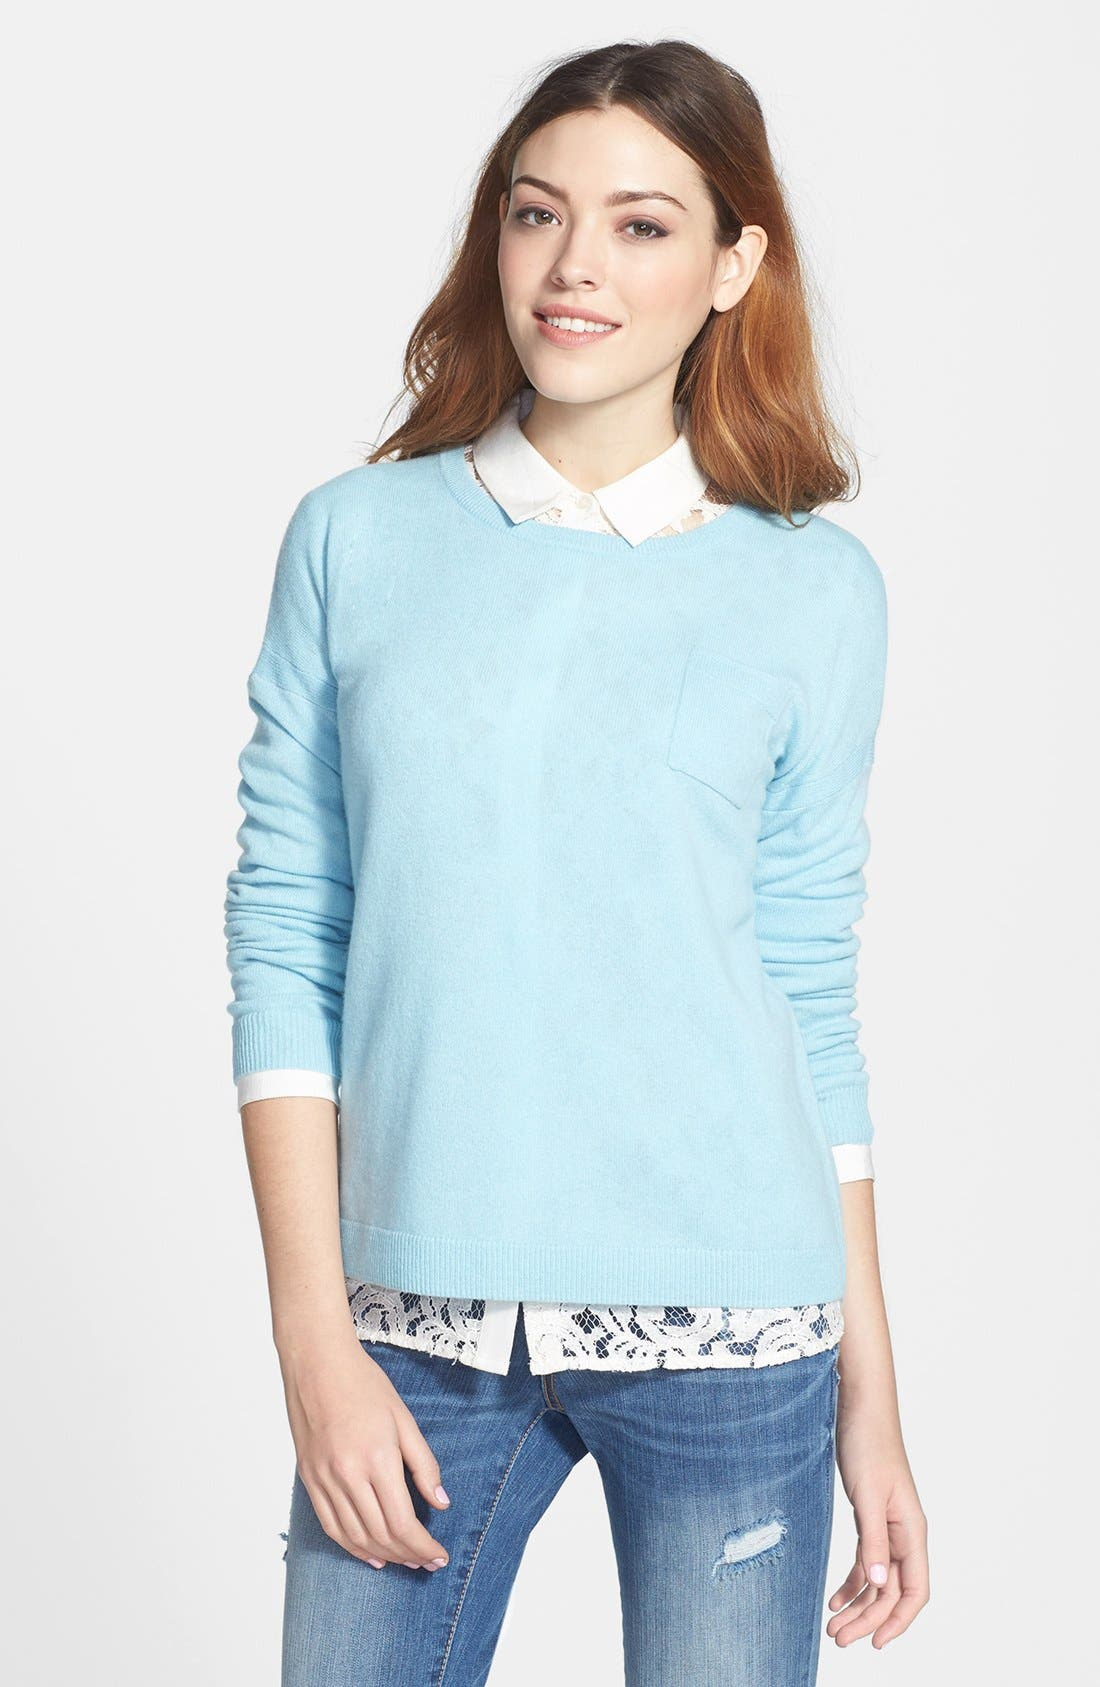 Alternate Image 1 Selected - Halogen® Lightweight Cashmere Crewneck Sweater with Pocket